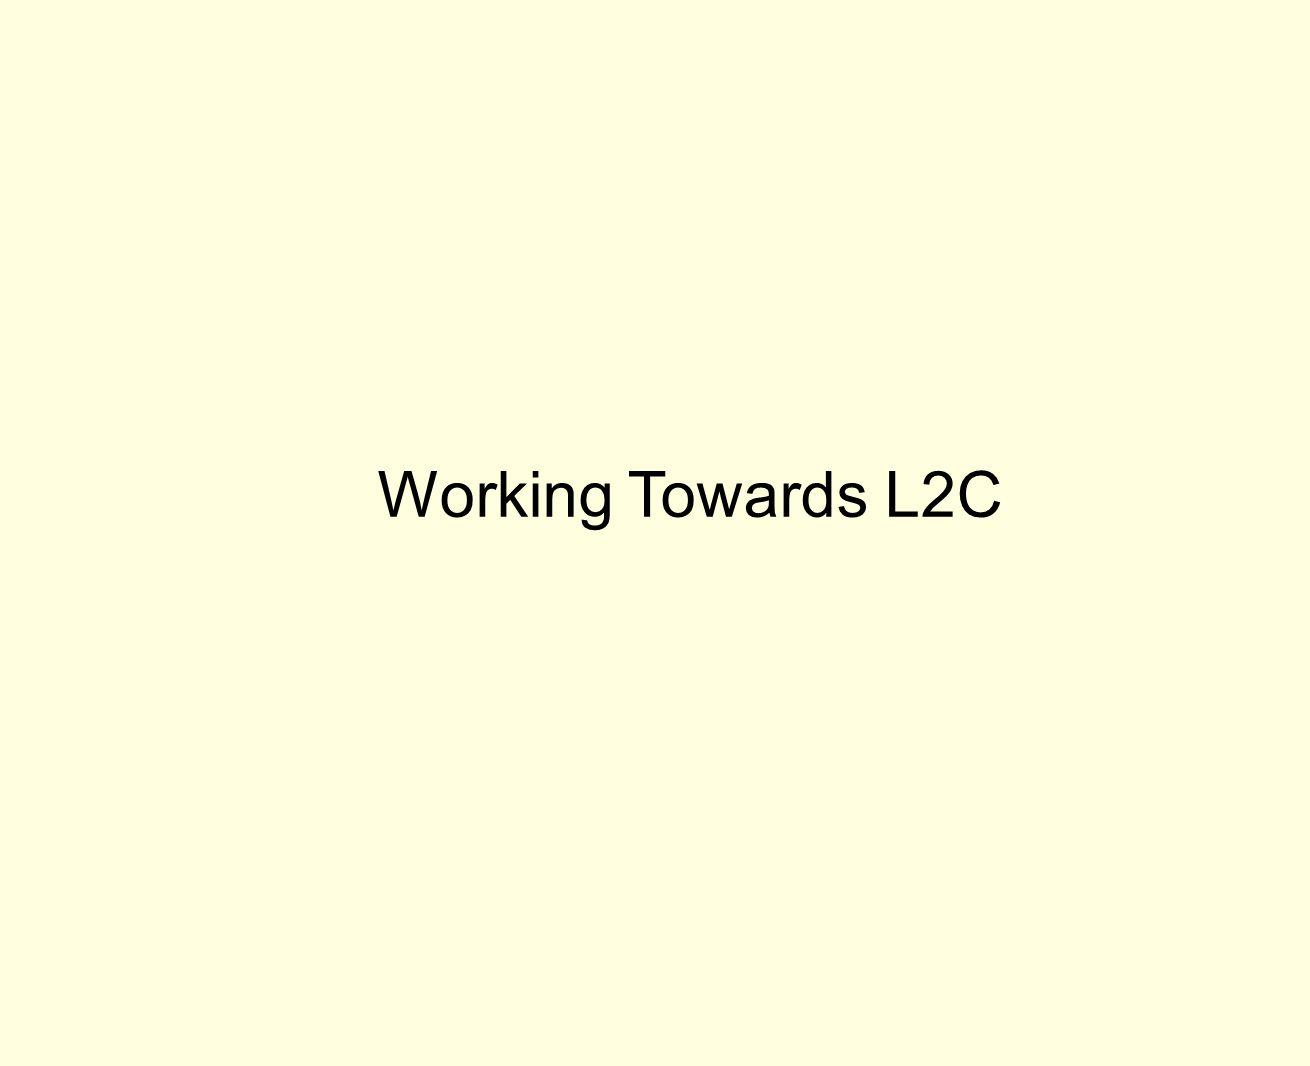 Working Towards L2C